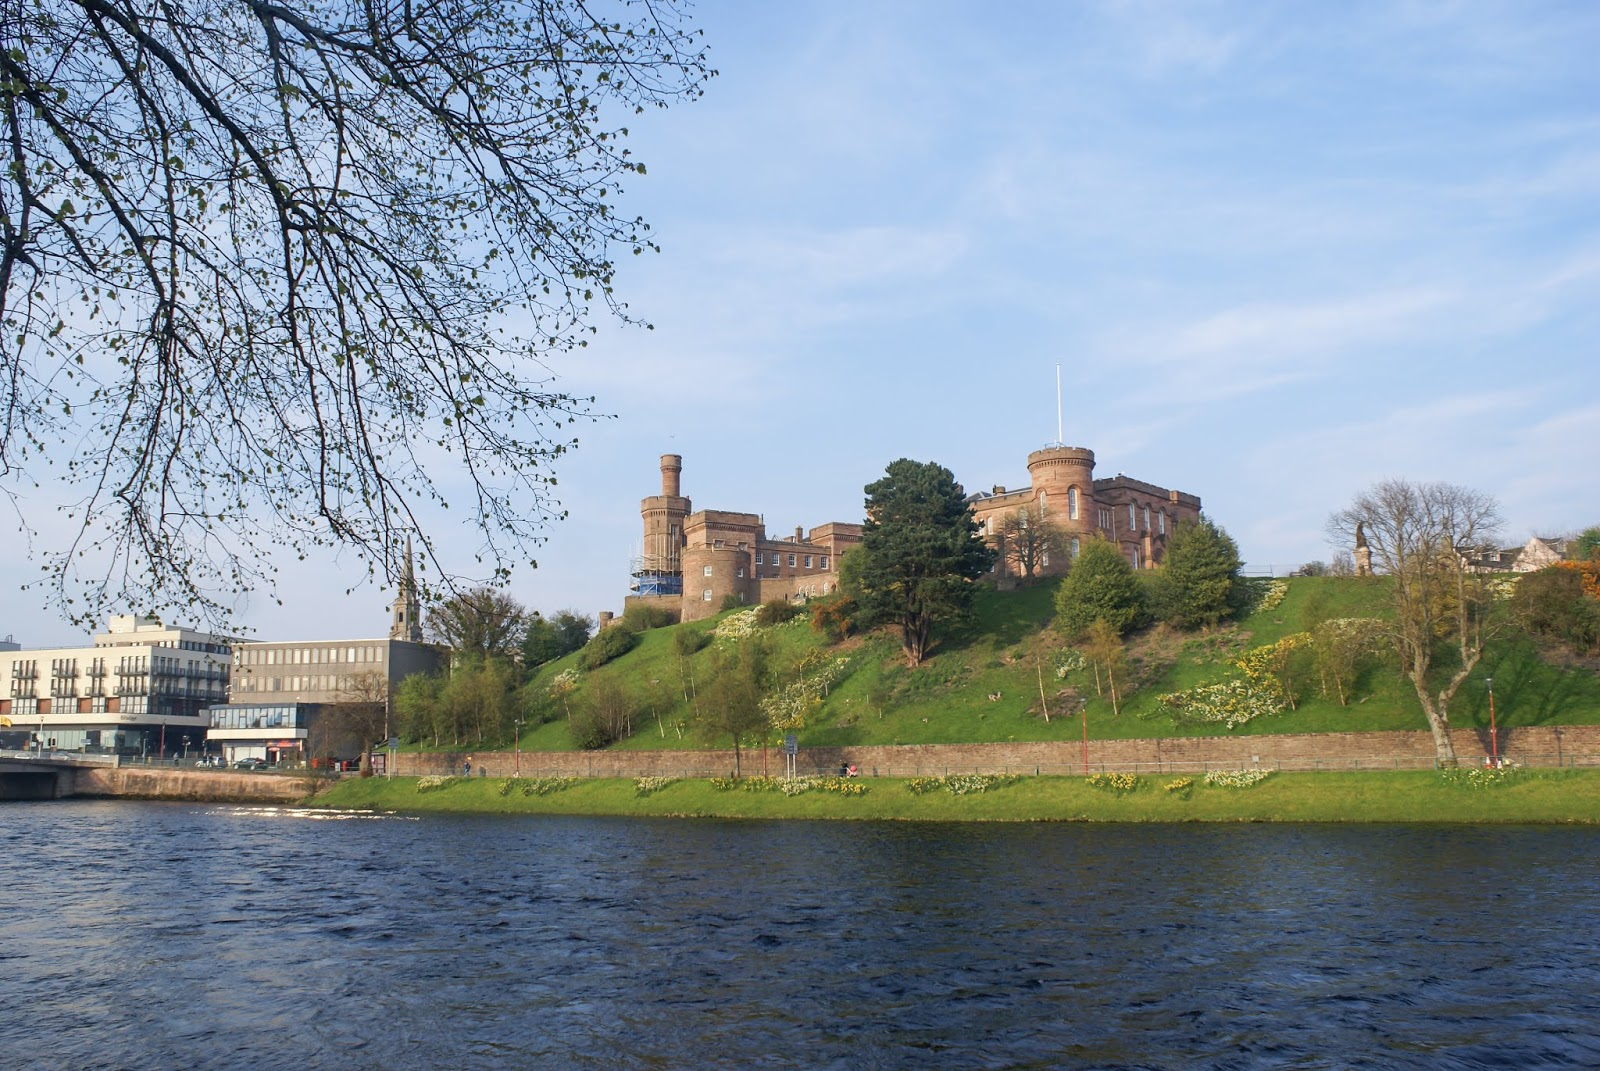 inverness ness scotland castle